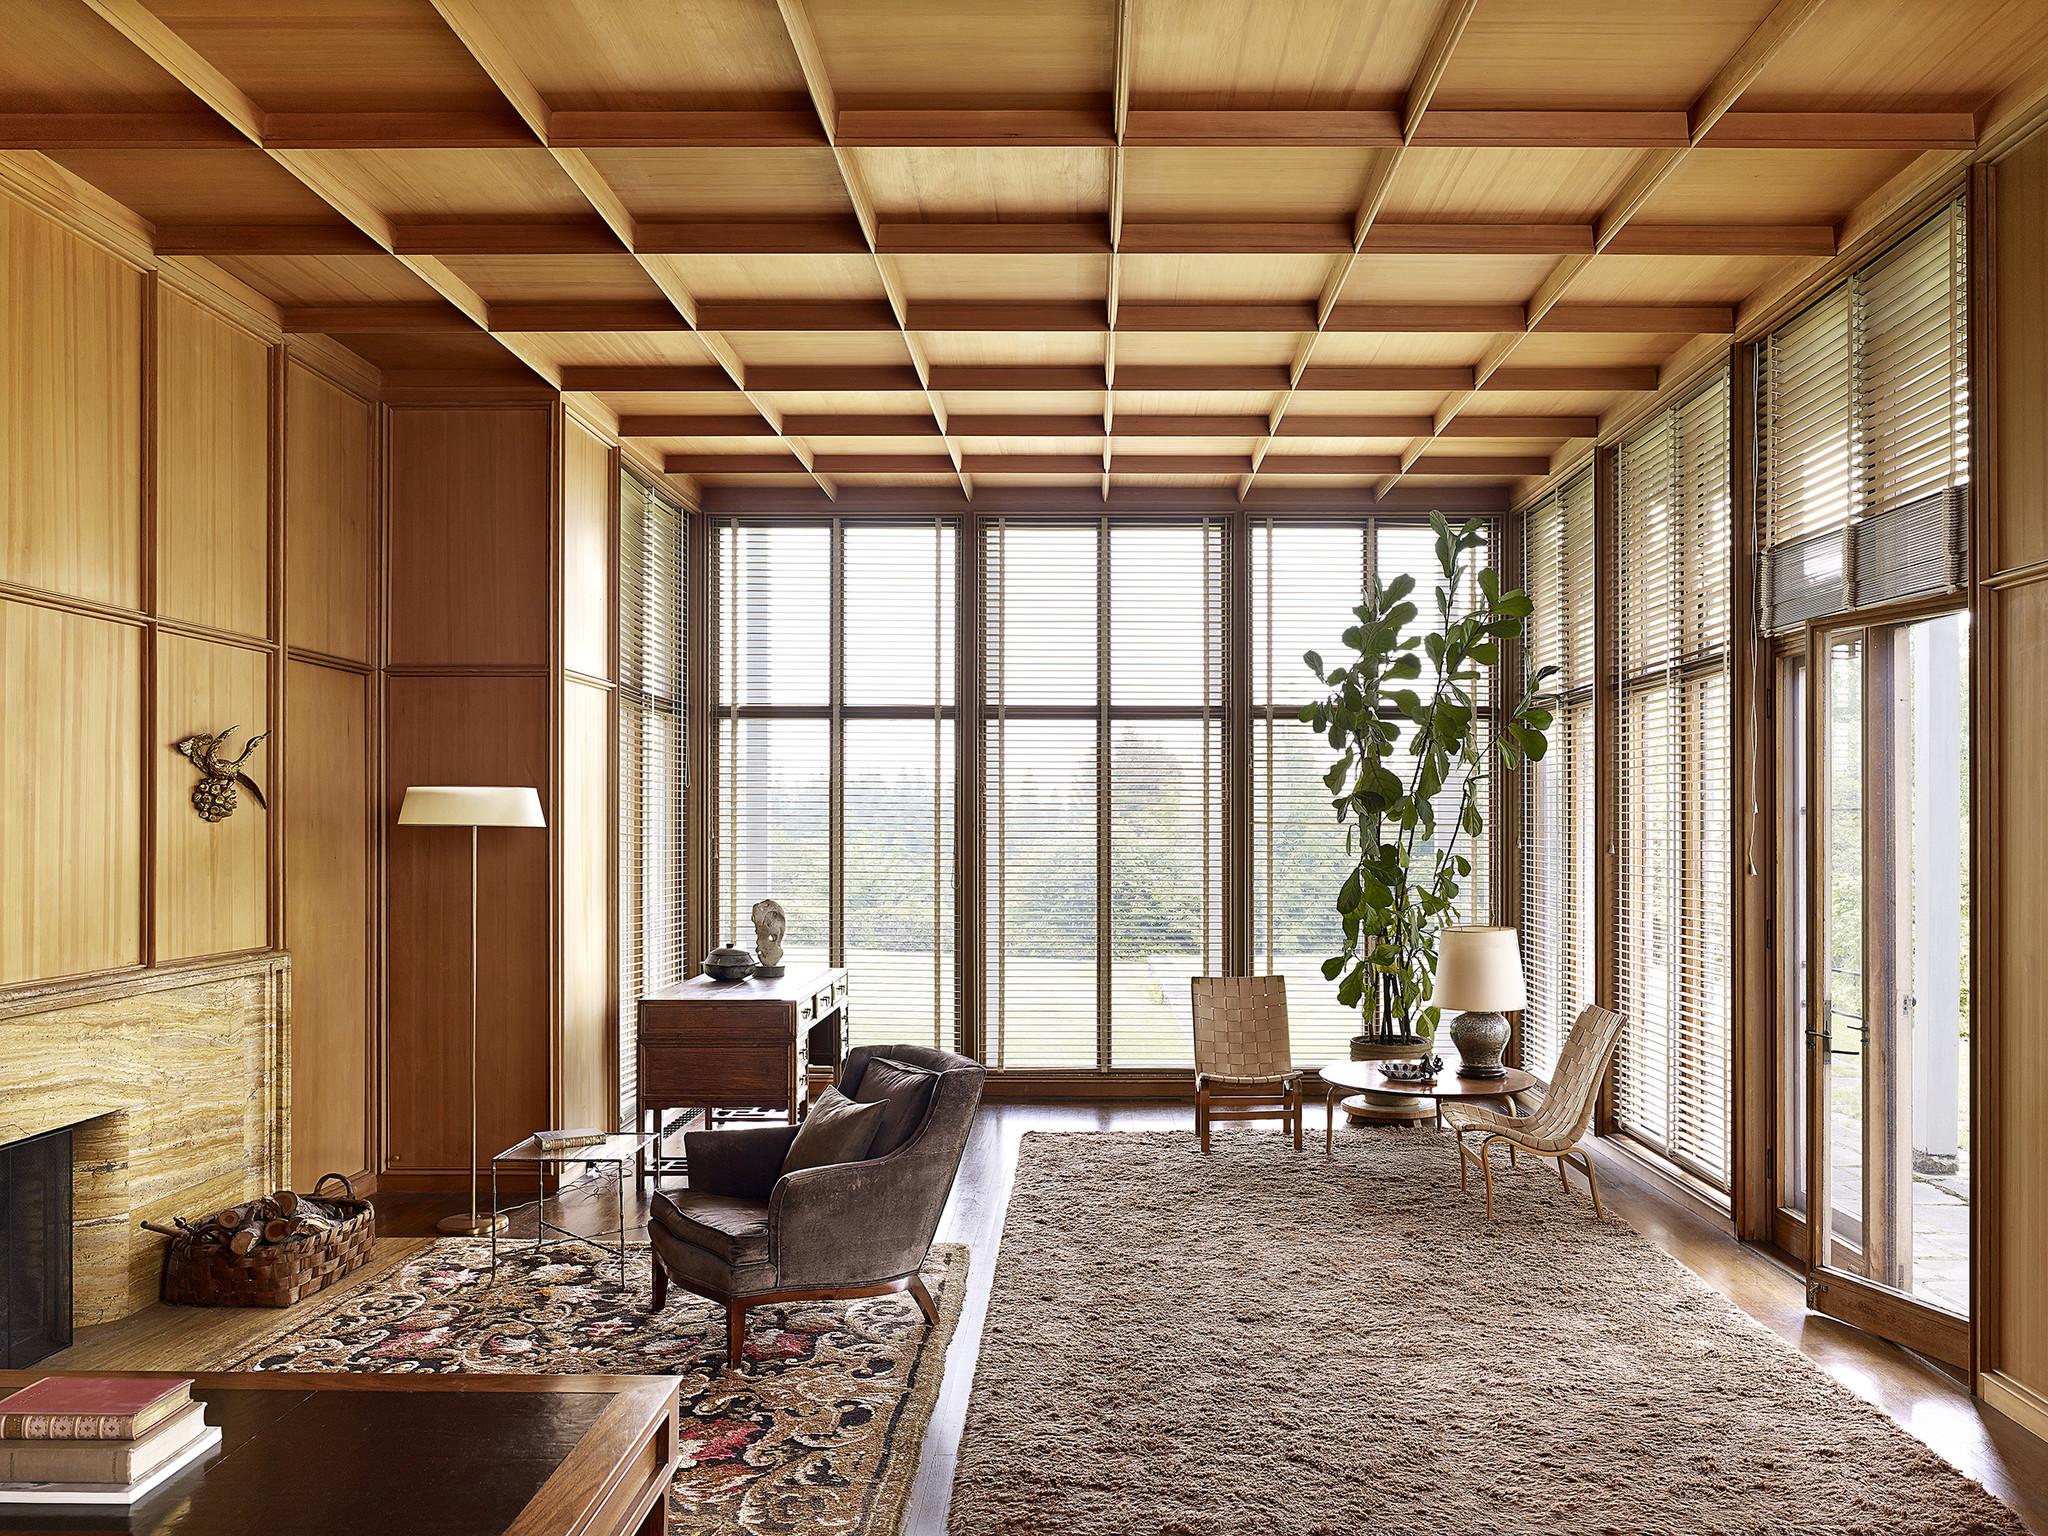 The living room of the Watzek House